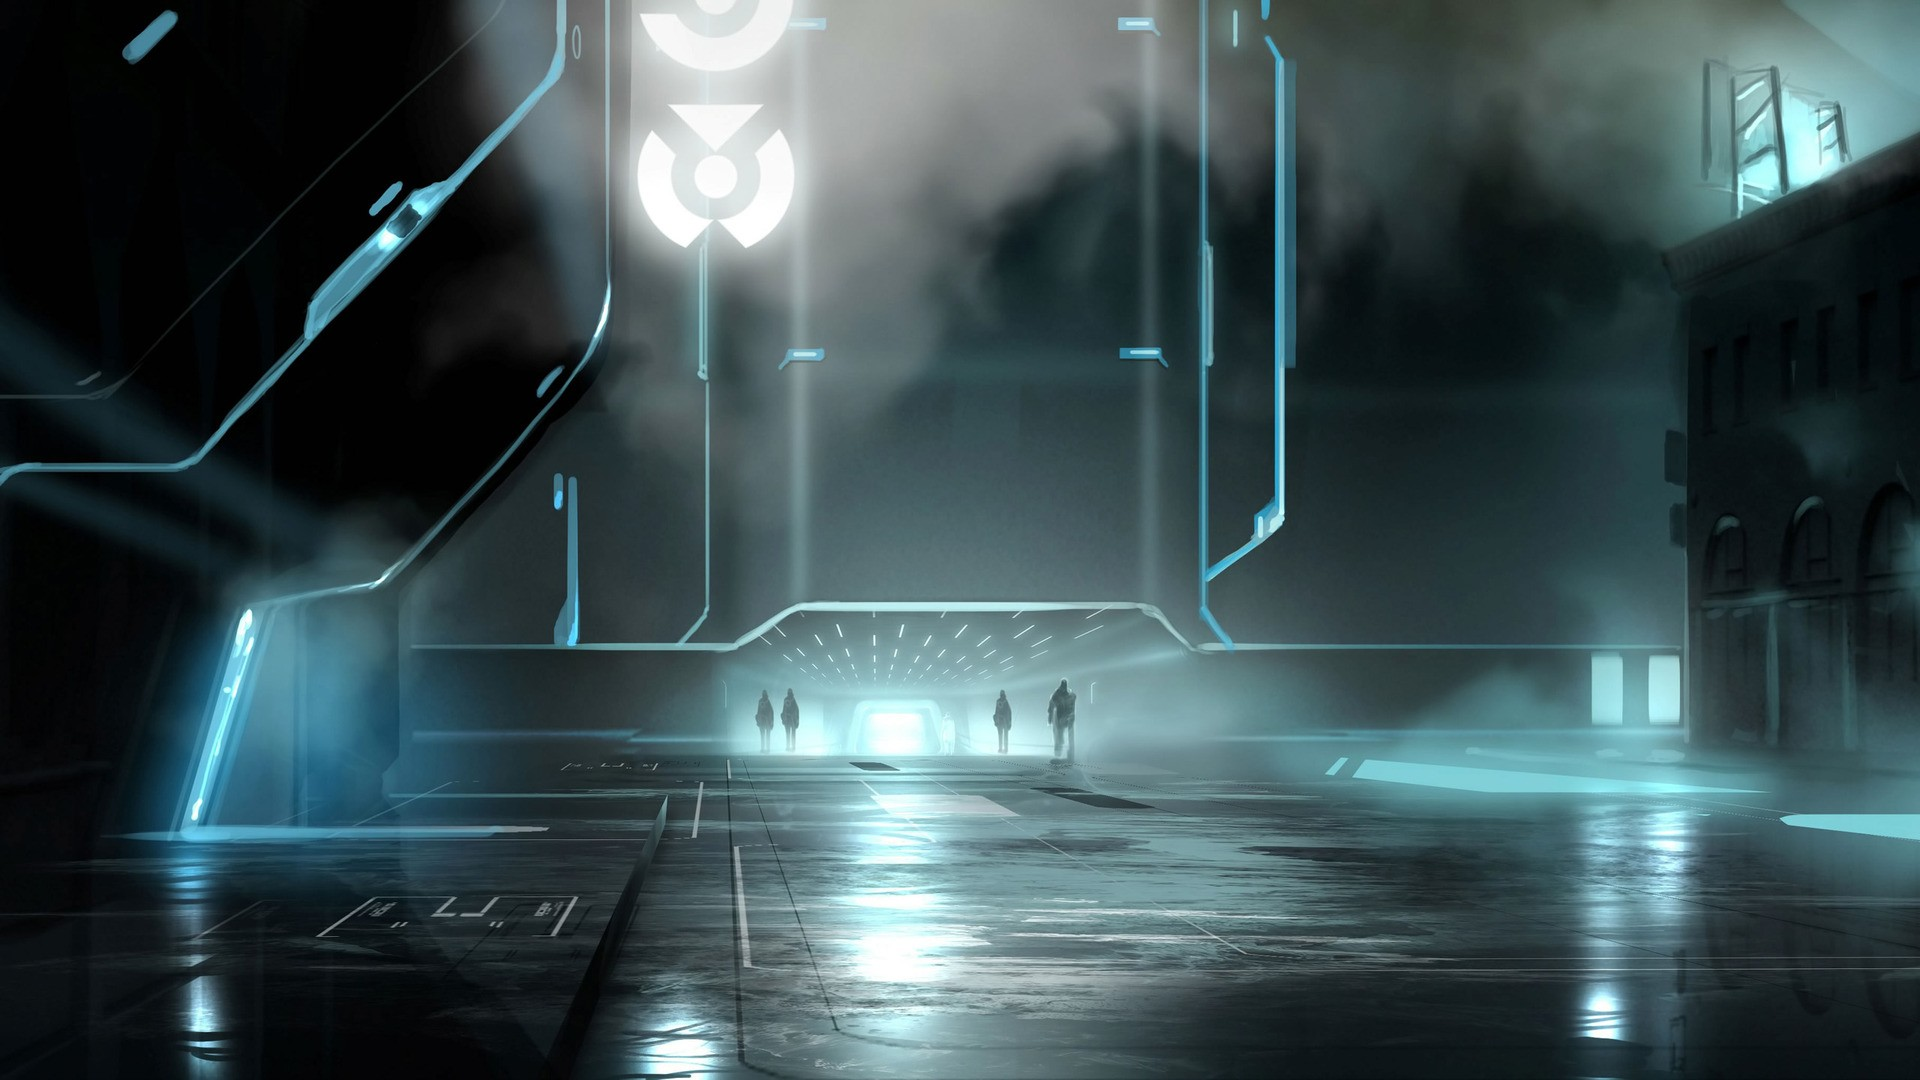 City Futuristic Fantasy Art Tron Artwork